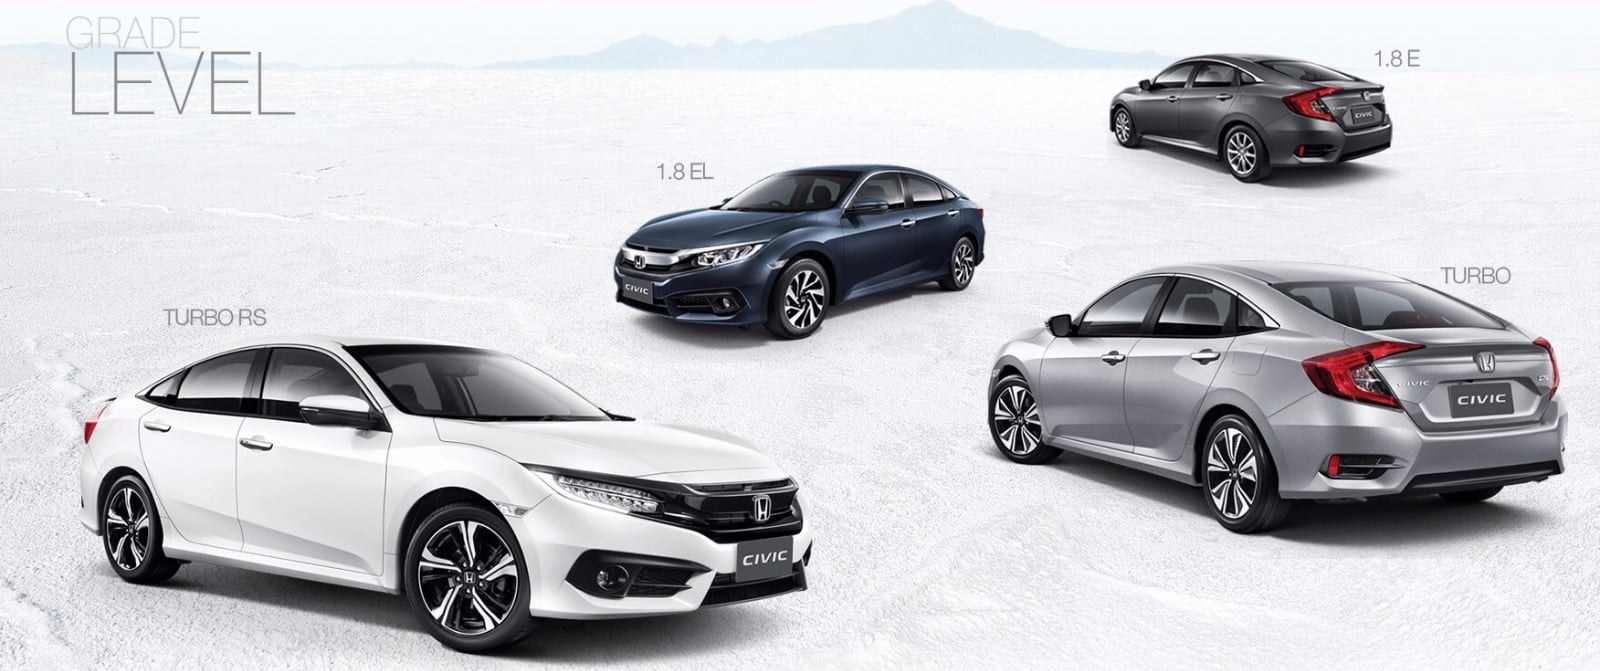 Amazing 2016 Honda Civic Thailand Official Images 2